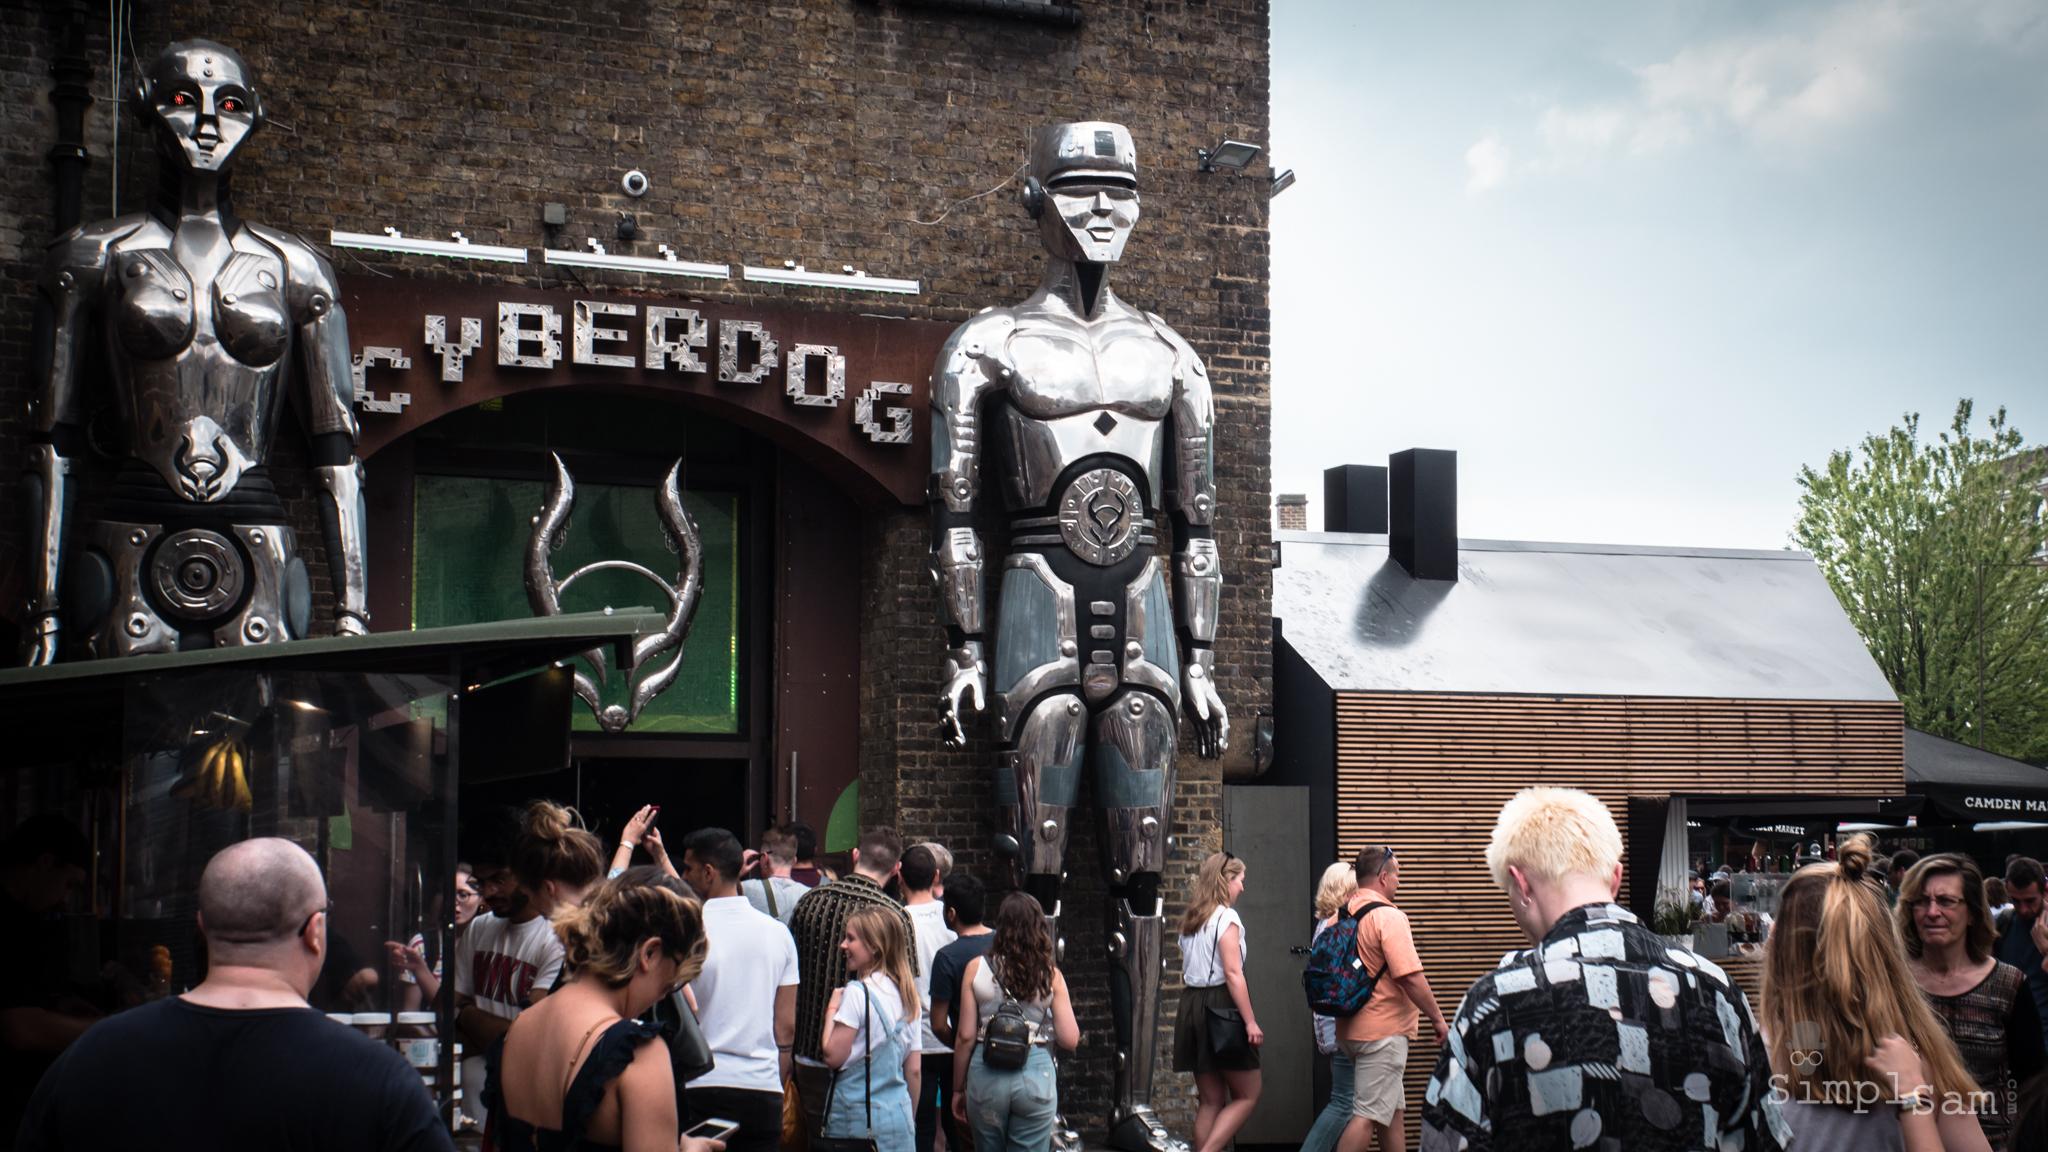 Camden Lock - Cyberdog